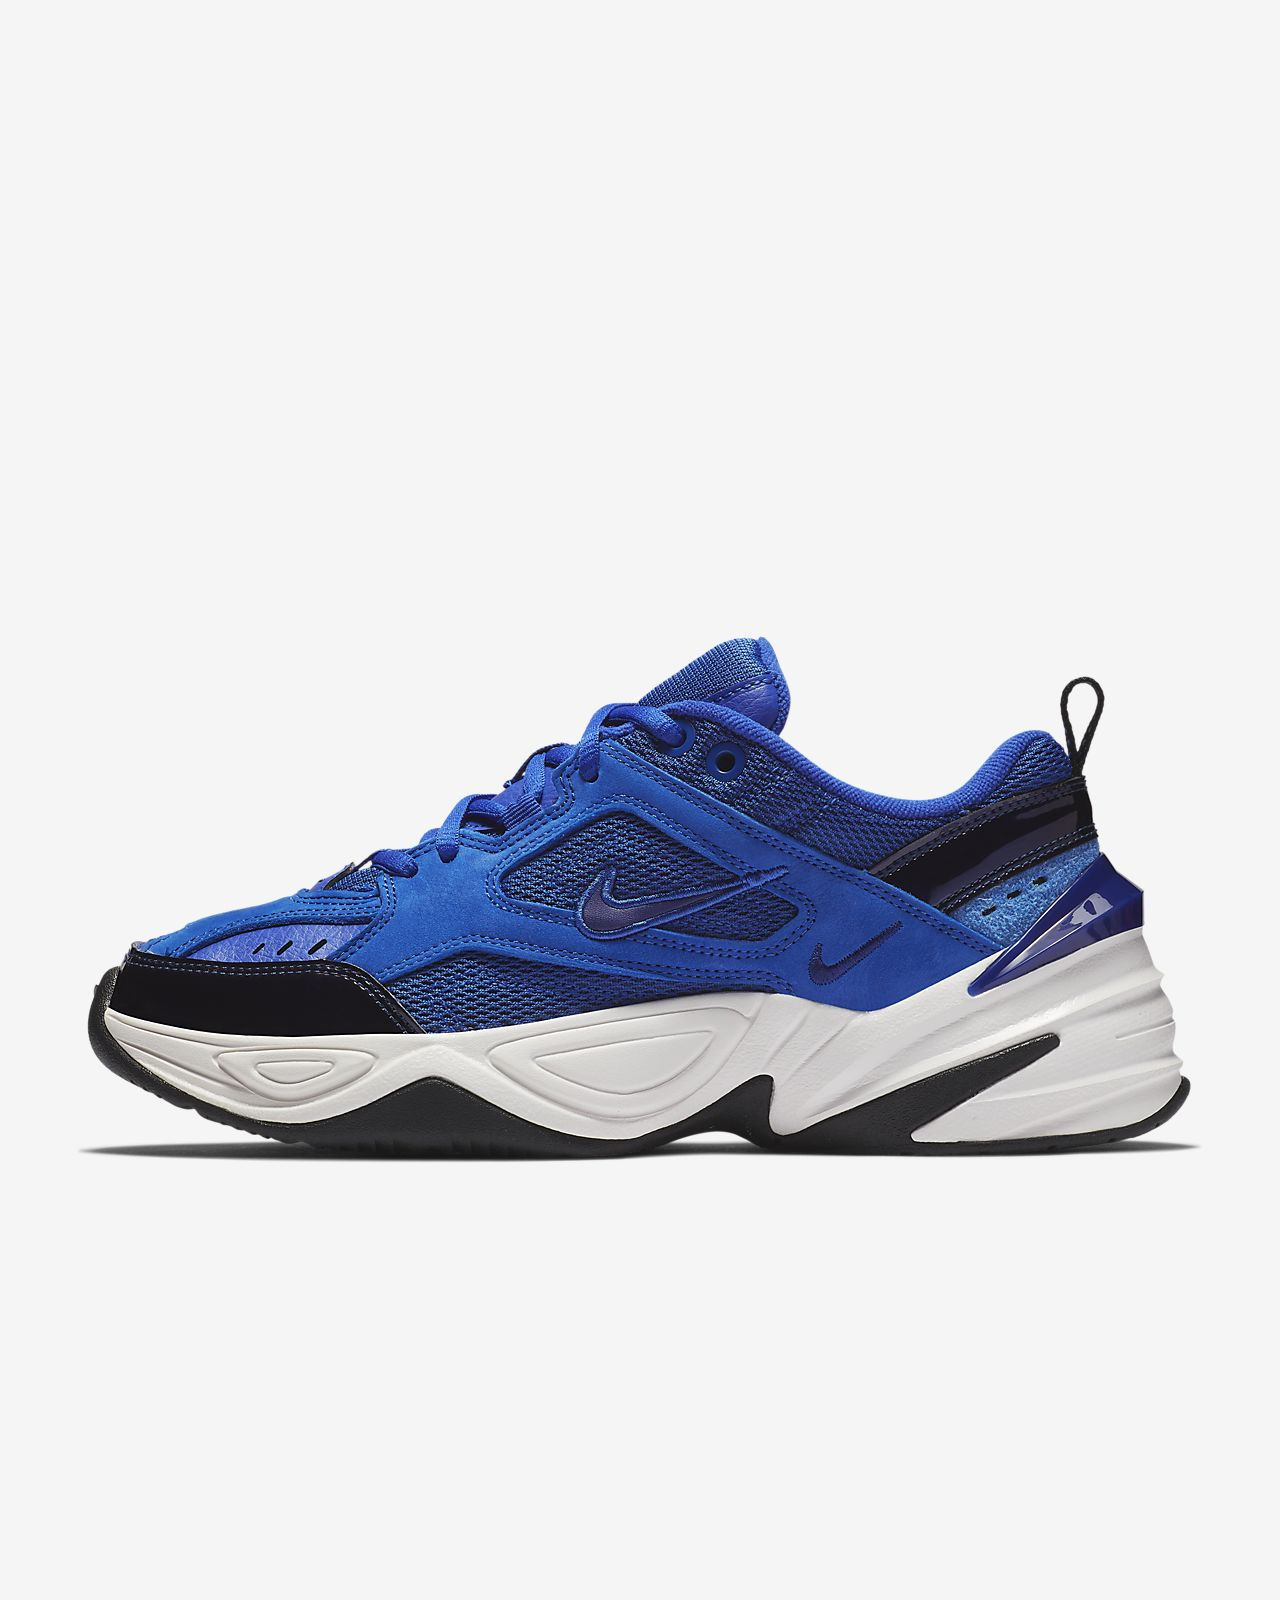 Mesh Scarpa It Donna Nike M2k Tekno pvpxqnzg